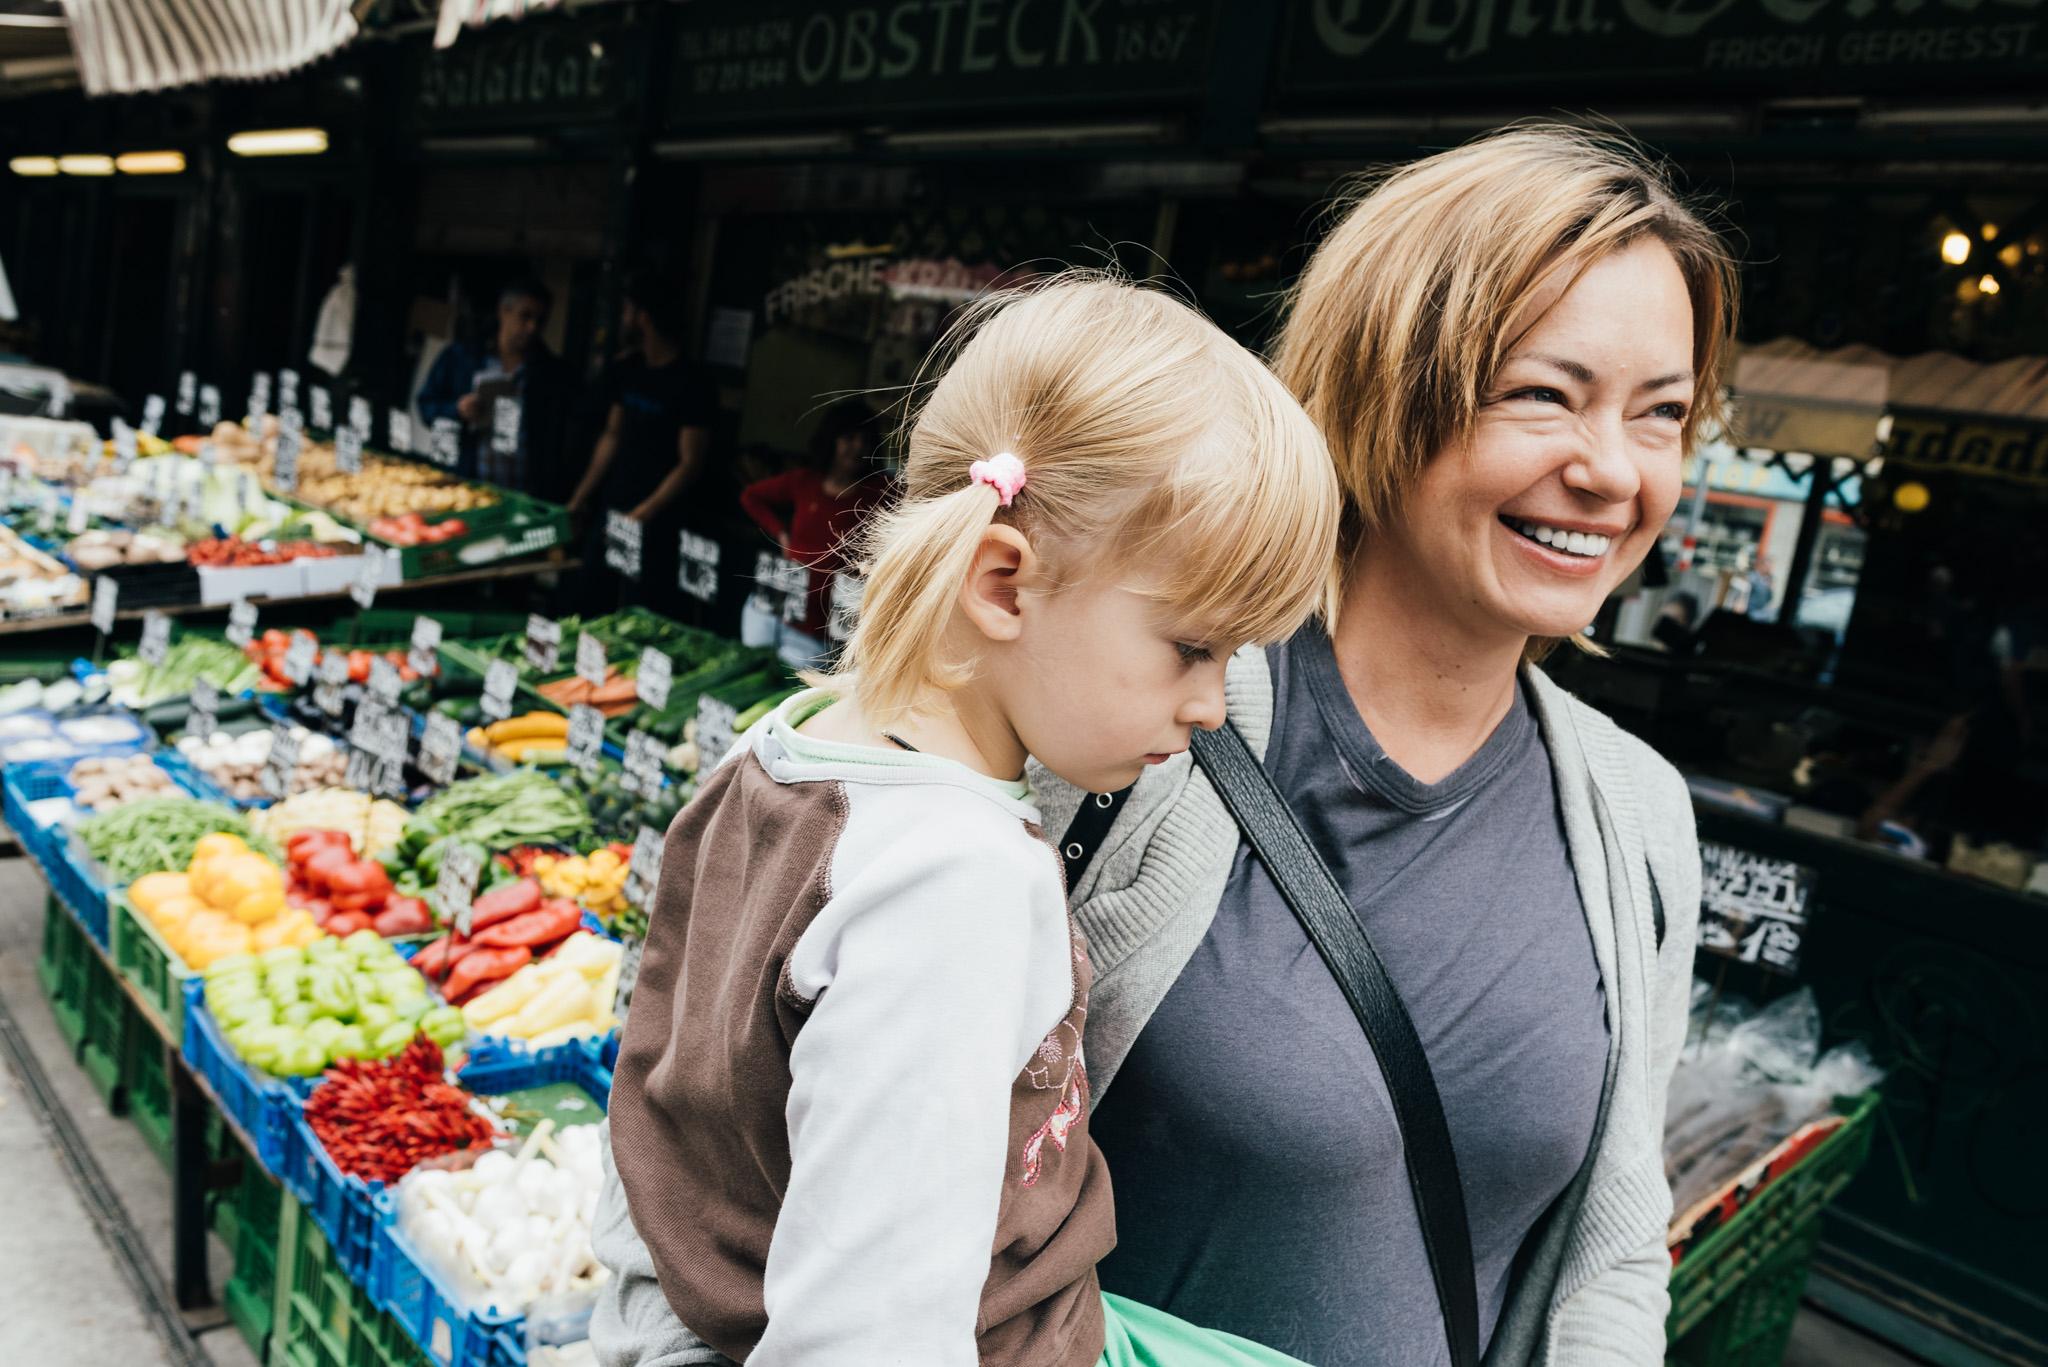 2017-09-13-Naschmarkt-23_LR edited_web.jpg